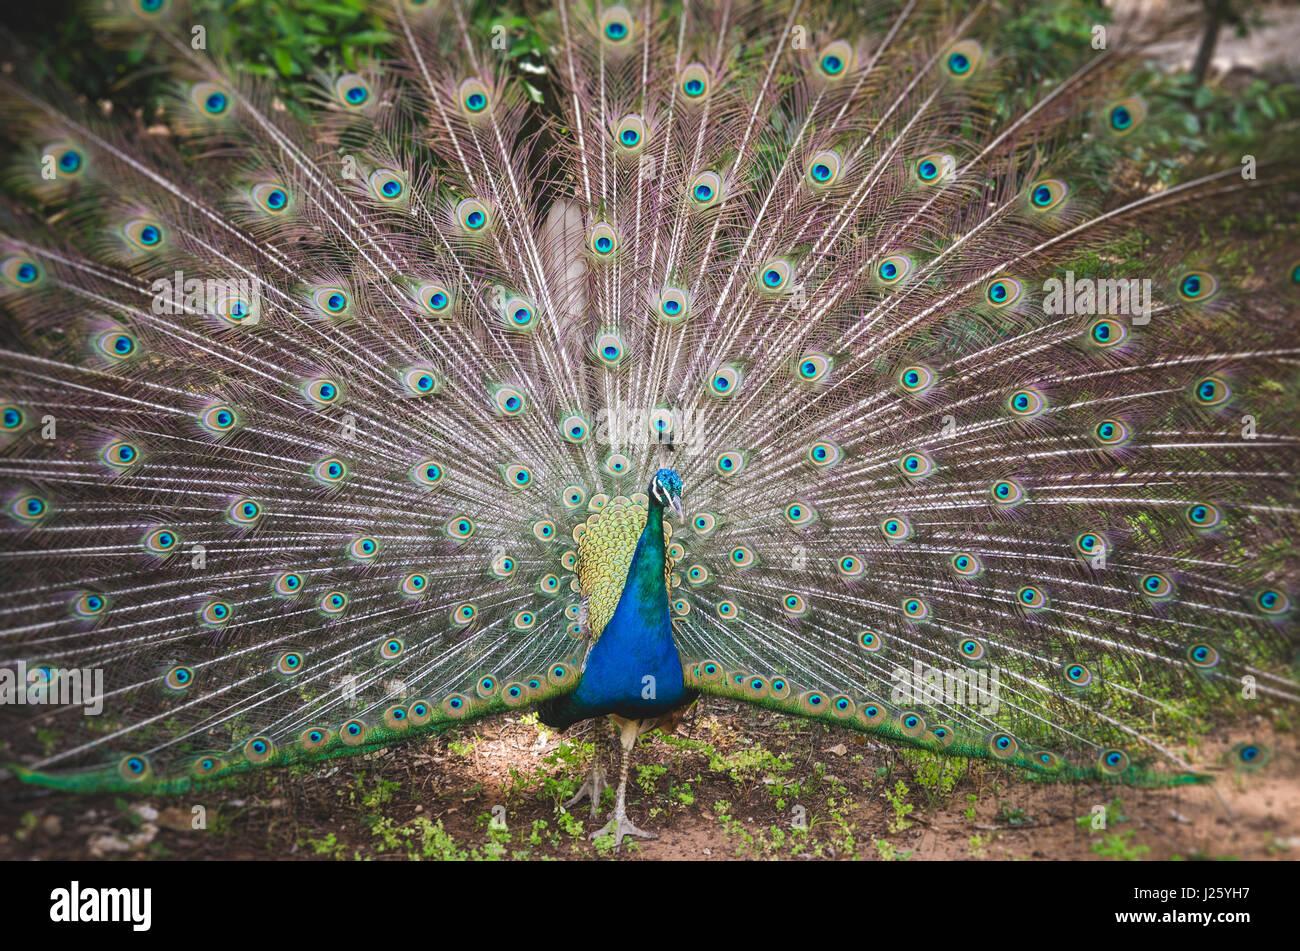 Peacock montrant la queue, Lokrum Botanical Garden, Croatie Photo Stock